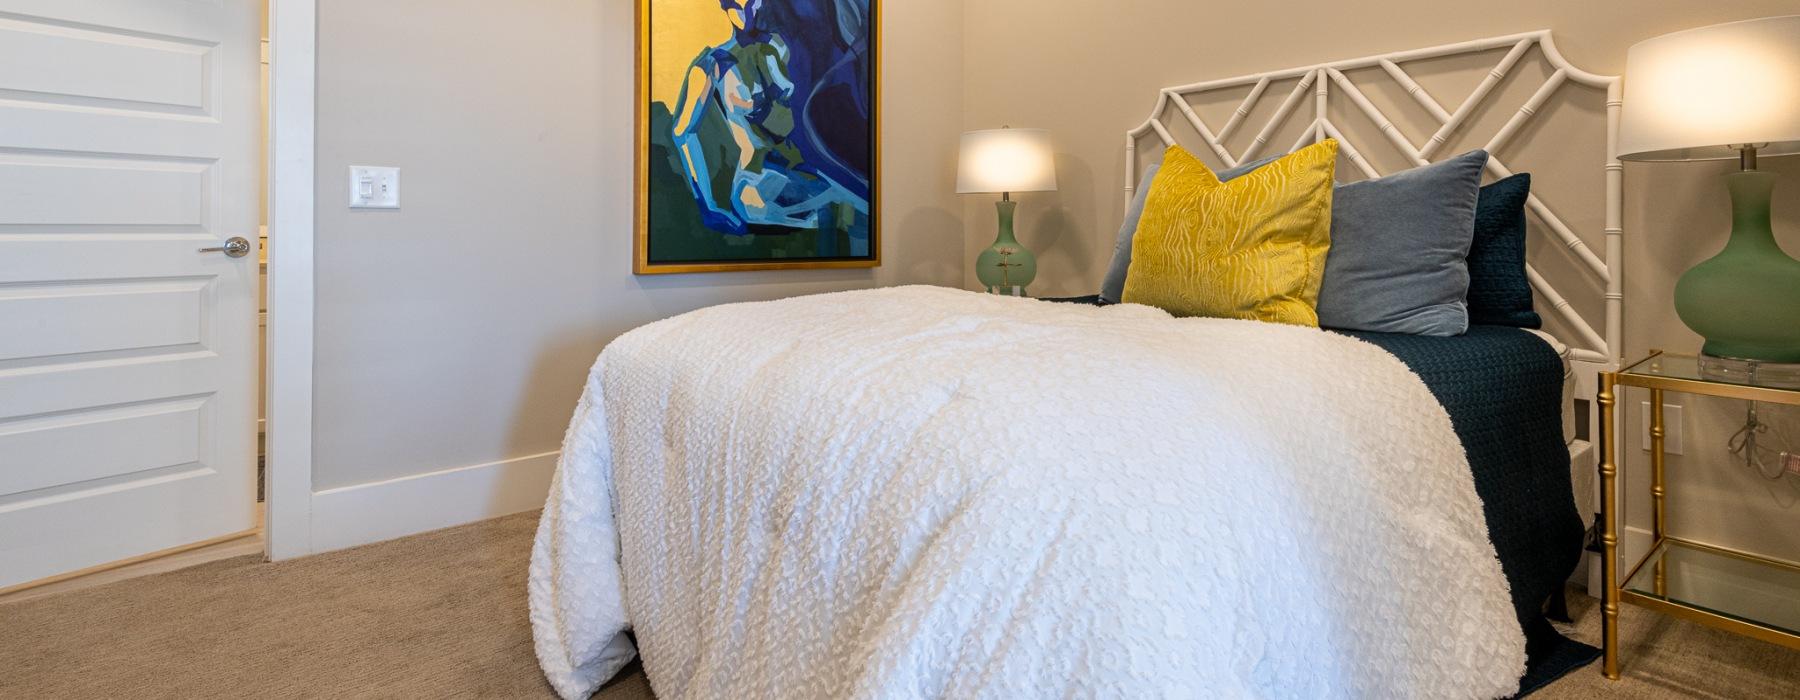 Spacious floor plans at Carraway Village Apartments in Chapel Hill, North Carolina